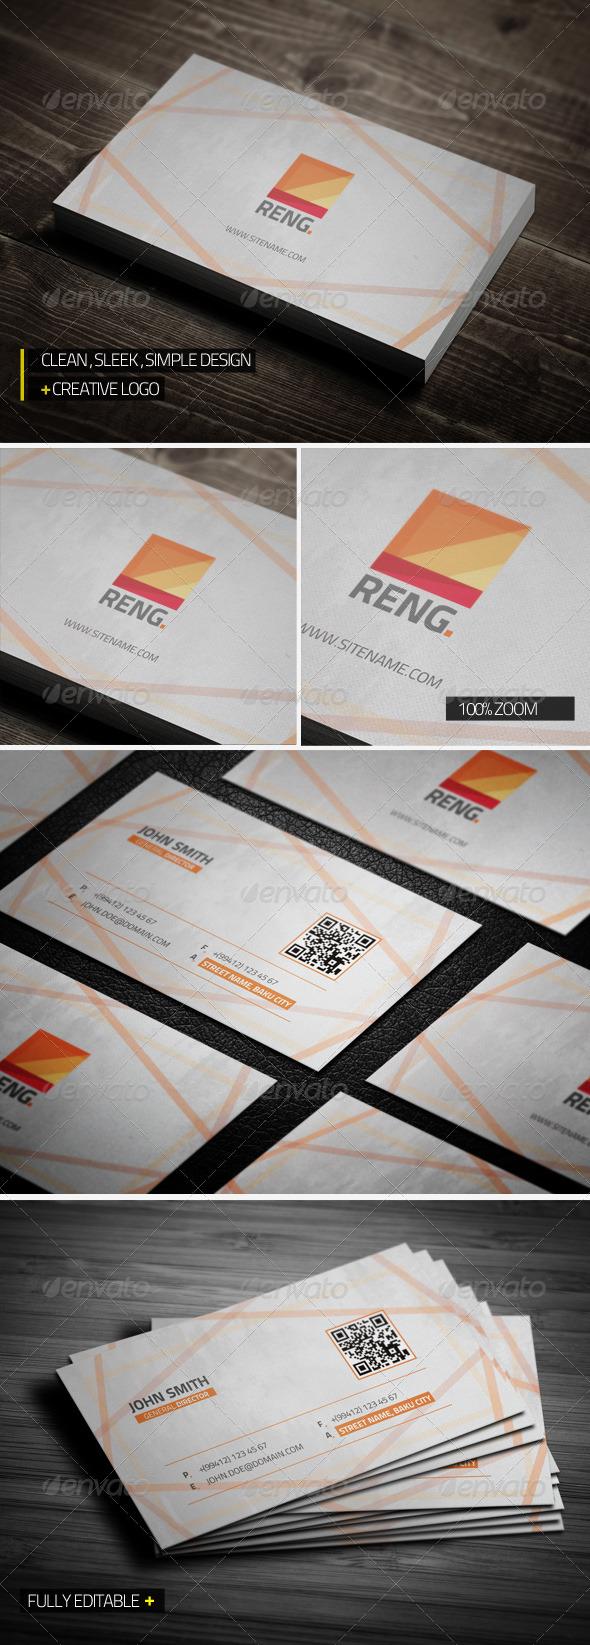 Reng Creative Business Card - Creative Business Cards